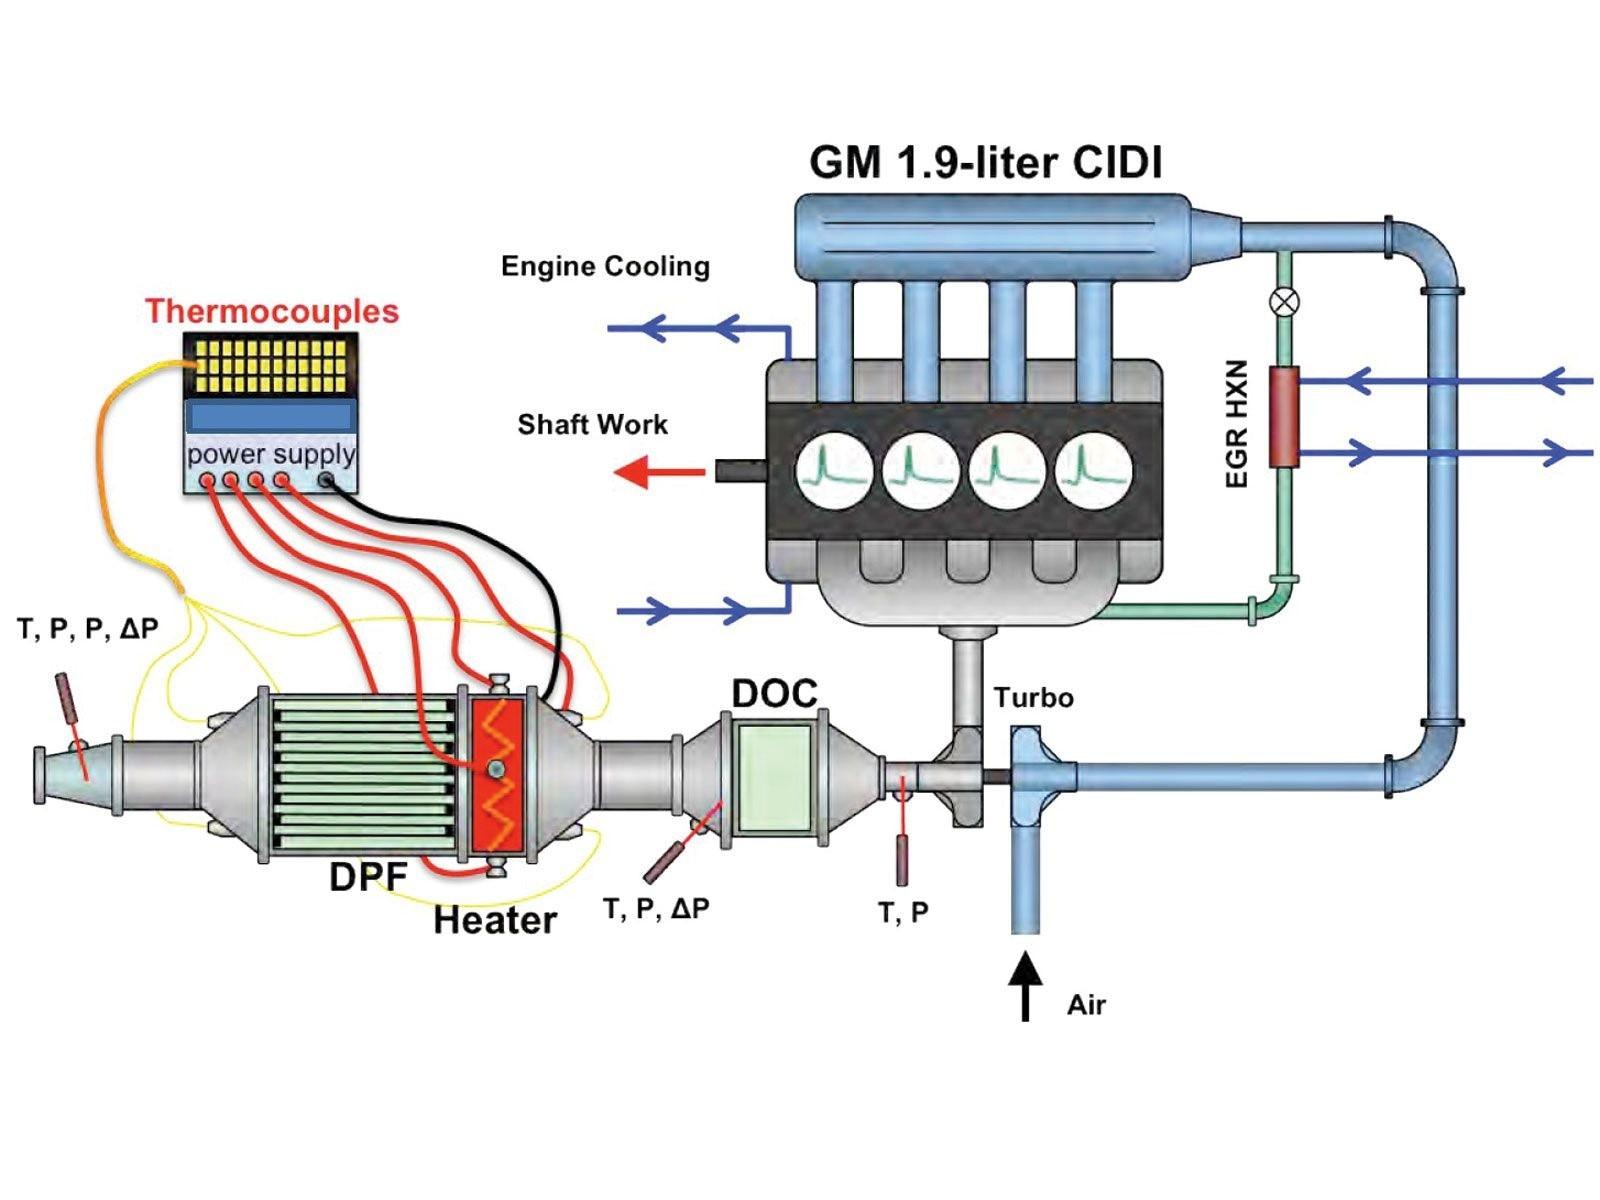 Cummins Engine Diagram Diesel Engine Diagram Four Cylinder Wiring Of A Motor for Tachometer Of Cummins Engine Diagram